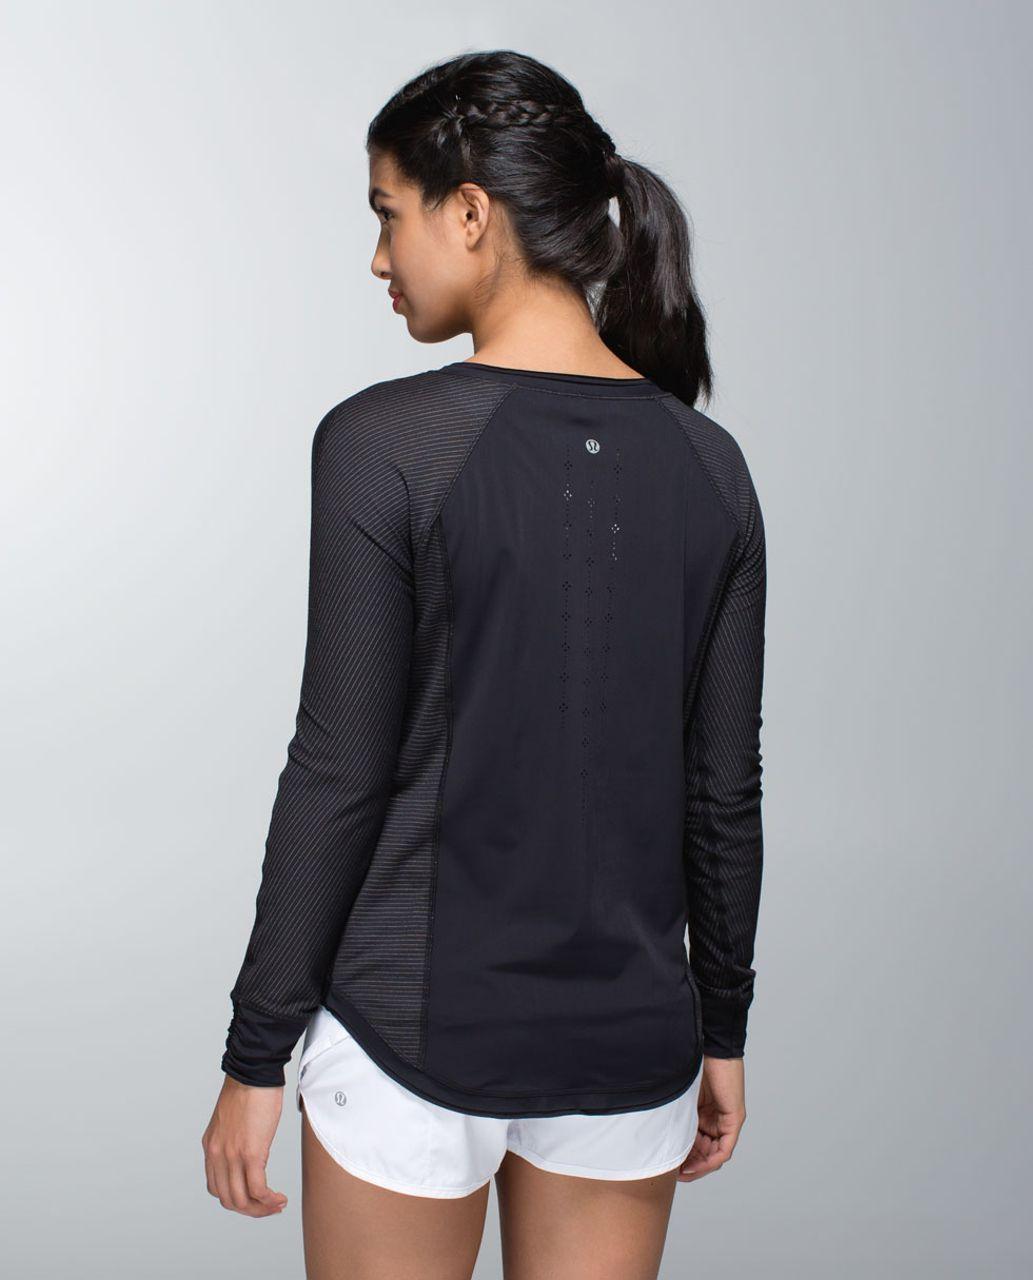 Lululemon Lightened Up Long Sleeve - Black